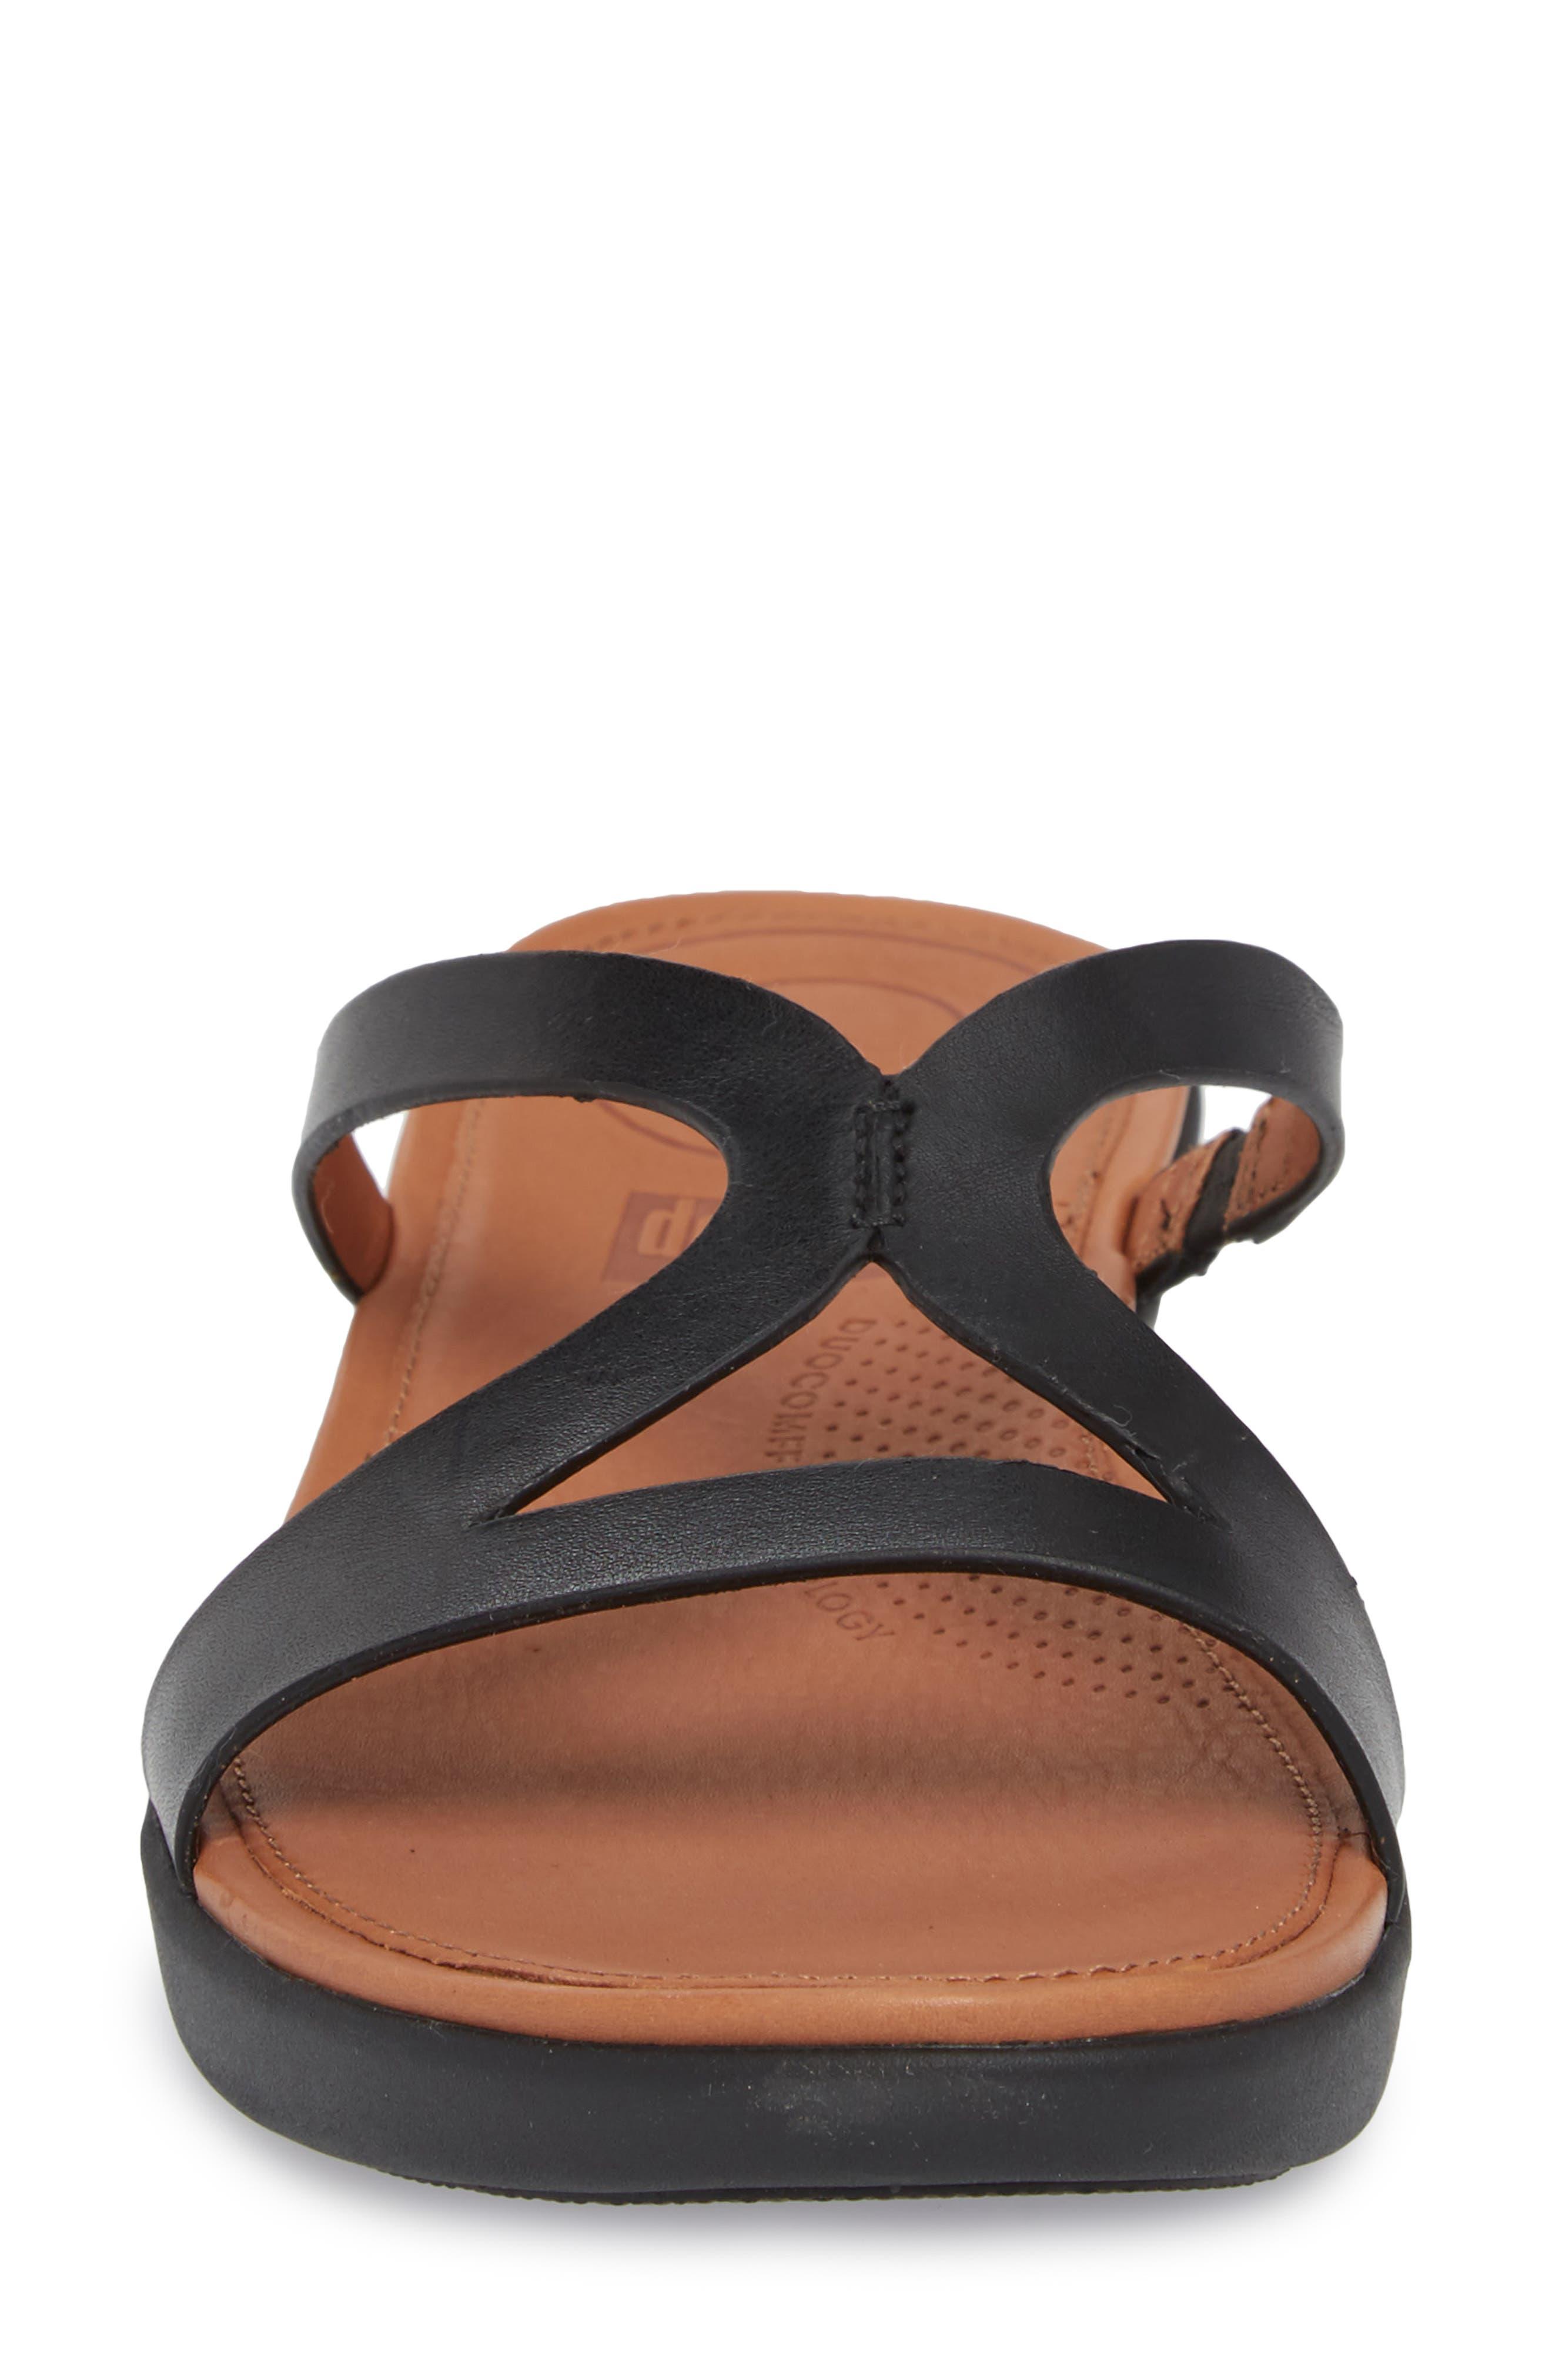 FITFLOP,                             Strata Slide Sandals,                             Alternate thumbnail 4, color,                             001